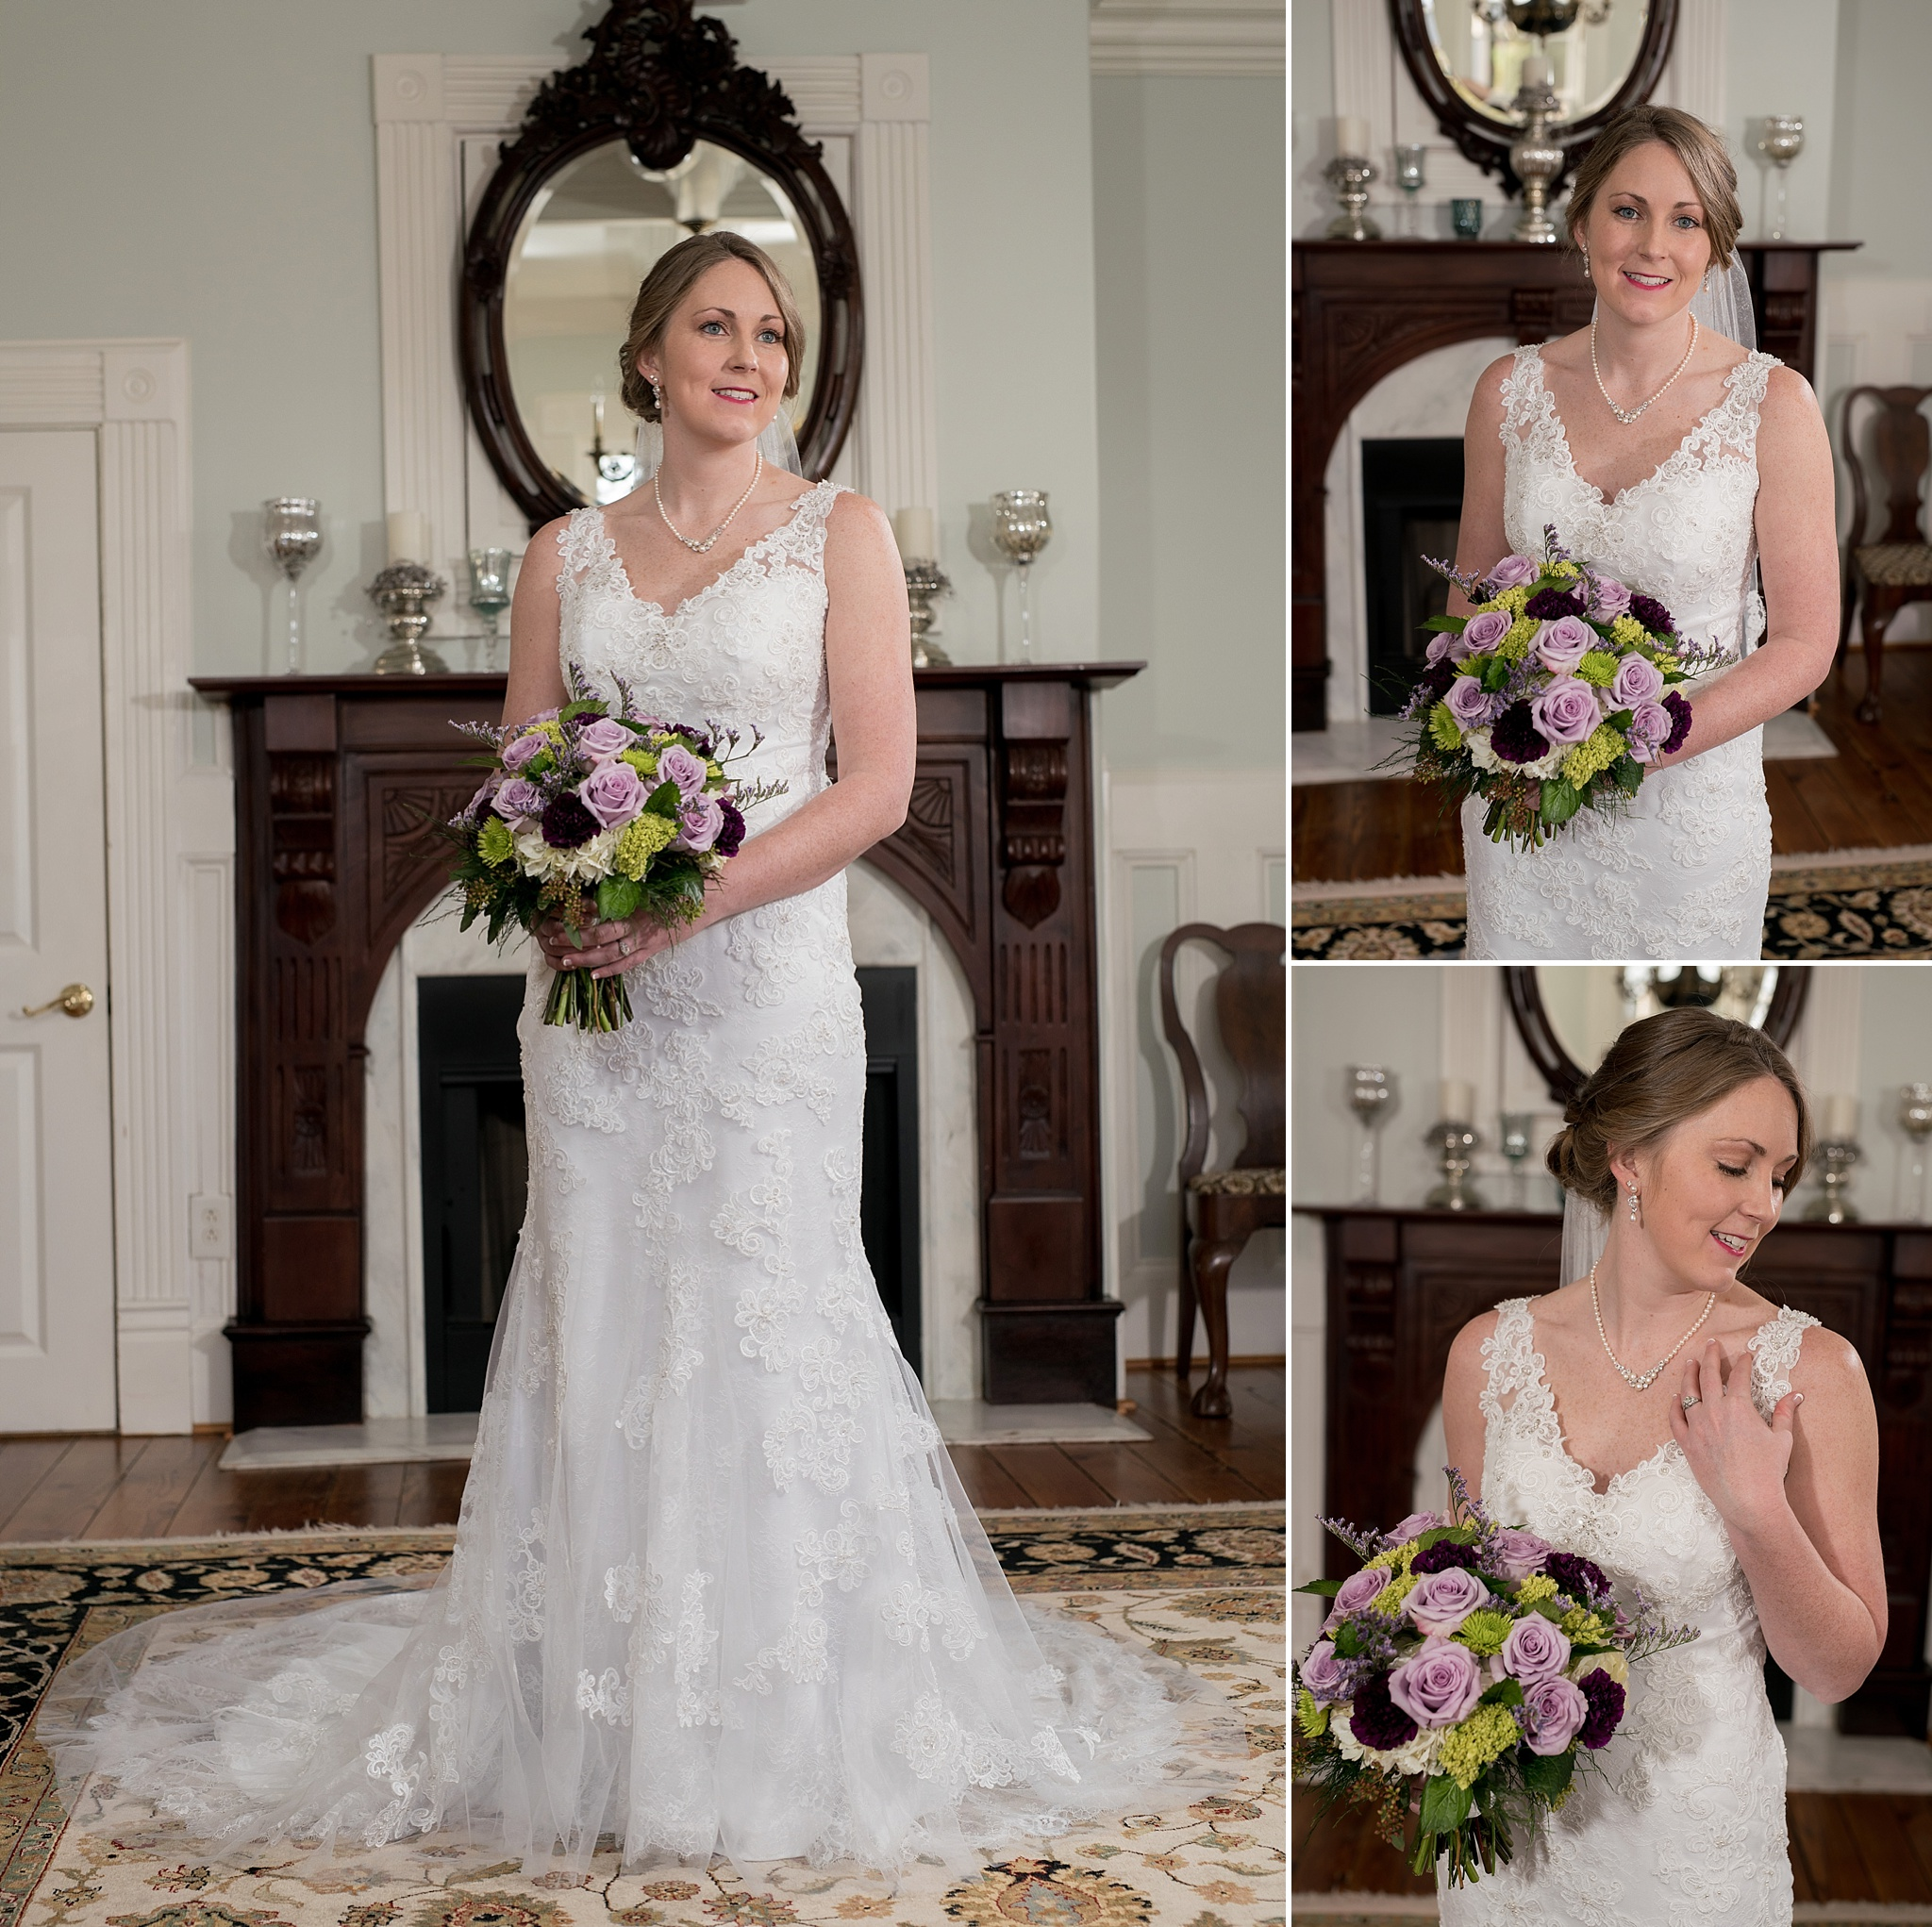 Yankee-Hall-Plantation-Wedding-NC-Photographer-0148.jpg